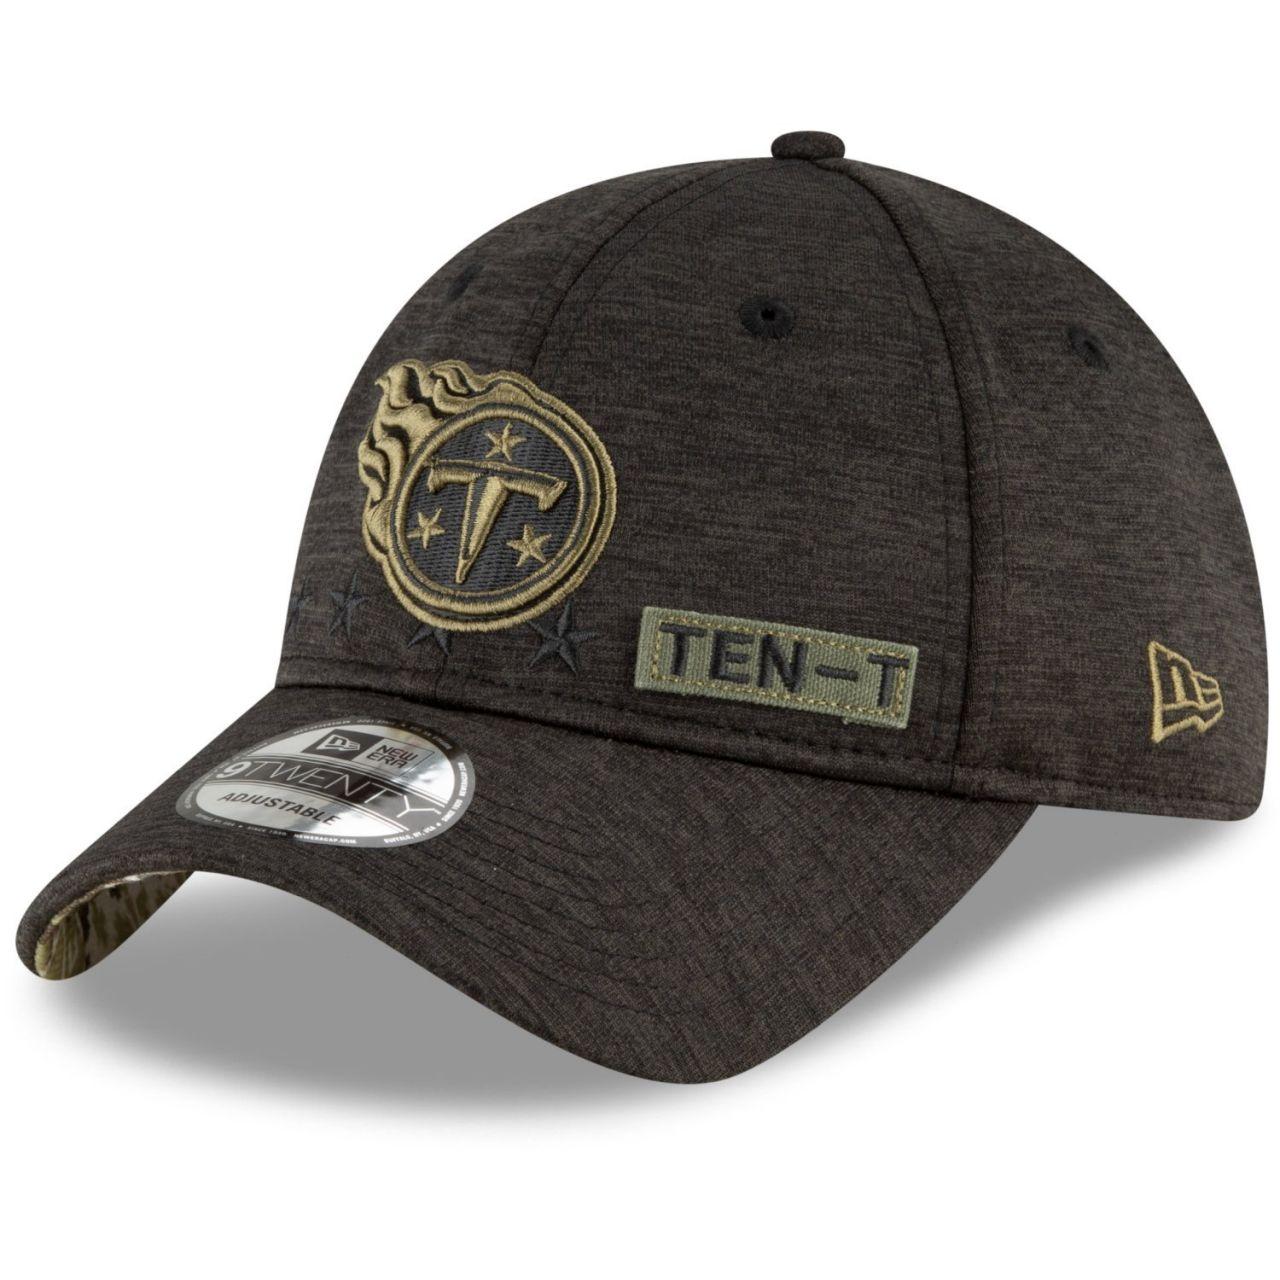 amfoo - New Era 9TWENTY Cap Salute to Service Tennessee Titans